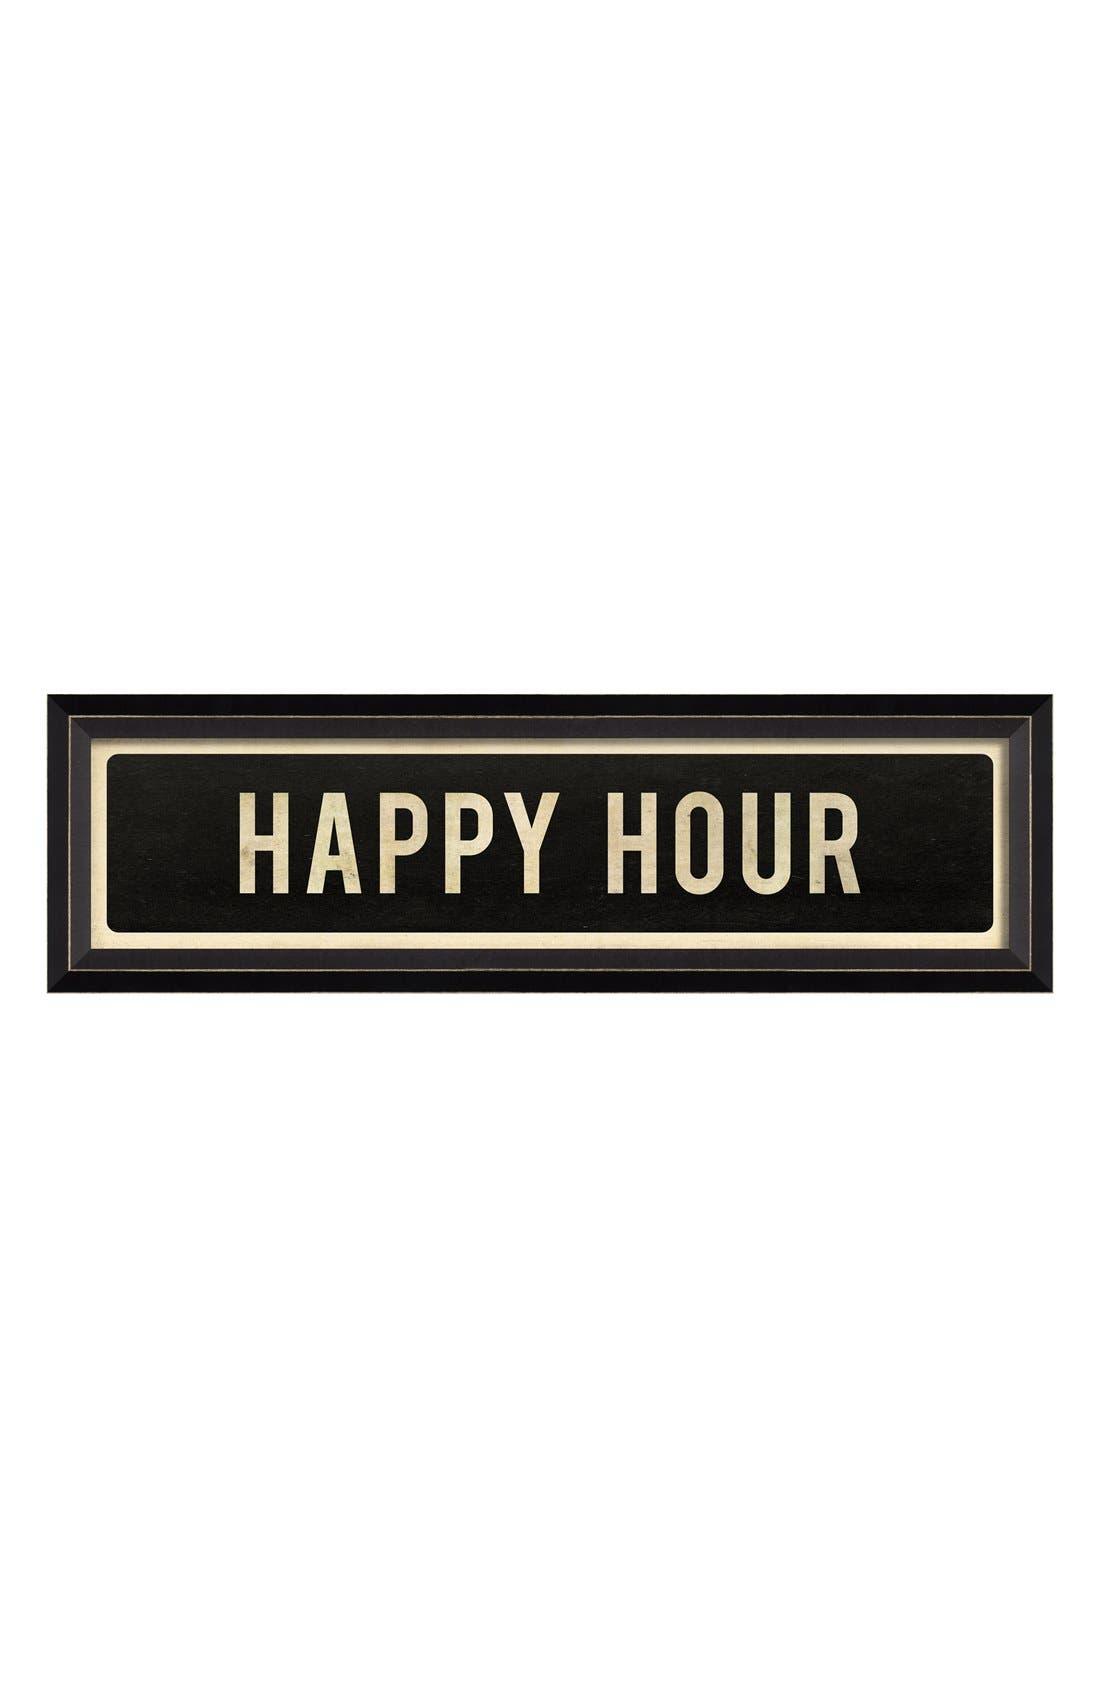 'Happy Hour' Vintage Look Street Sign Artwork,                             Main thumbnail 1, color,                             001